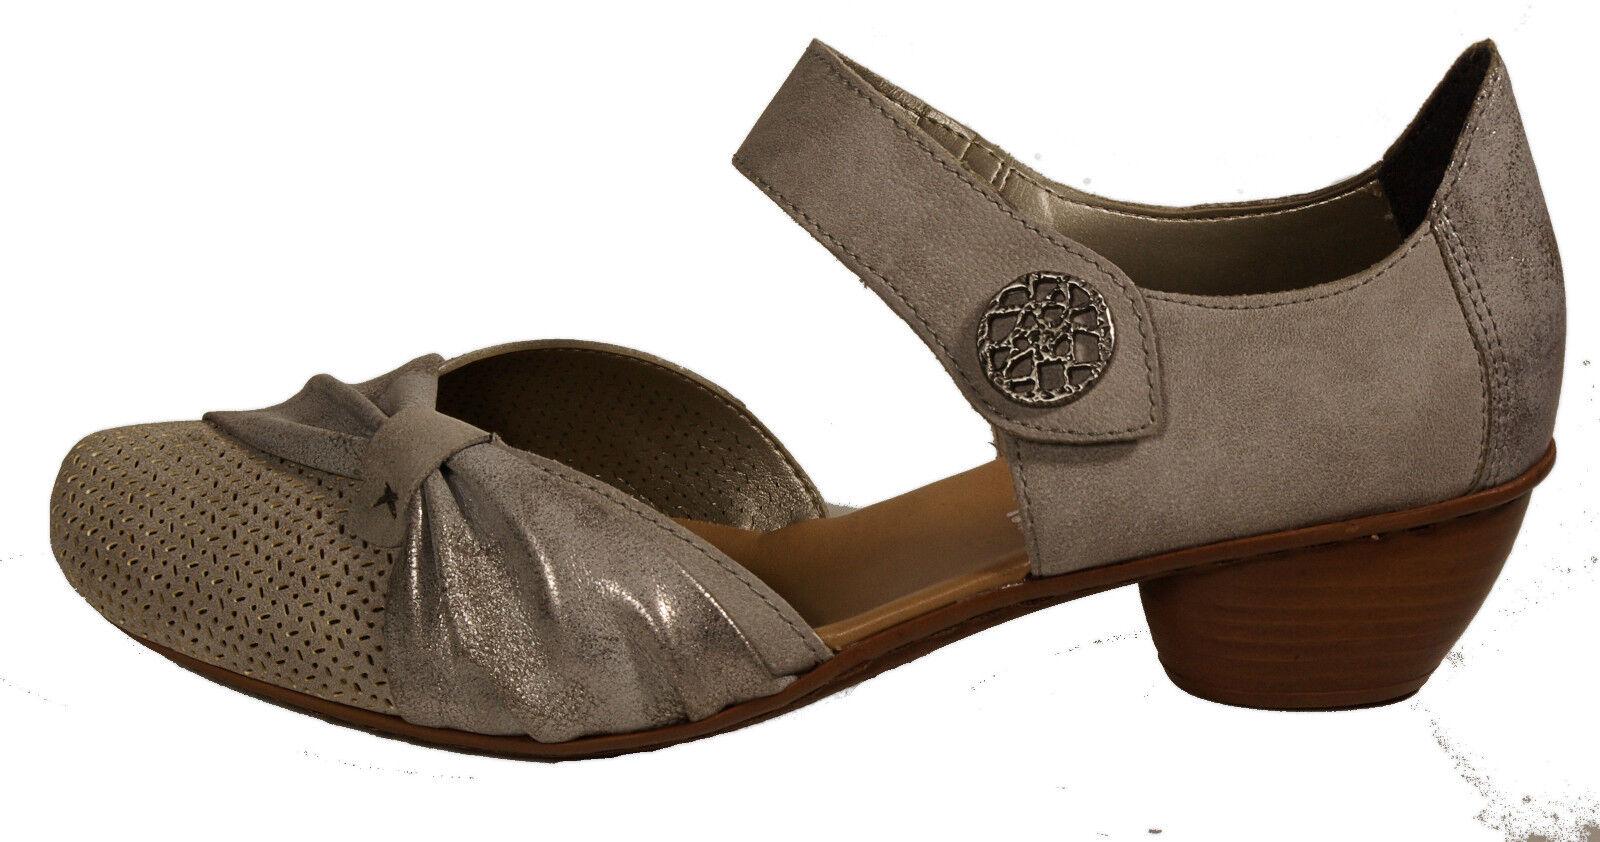 RIEKER Schuhe Pumps  Mary Jane   silber grau metallic   NEU6